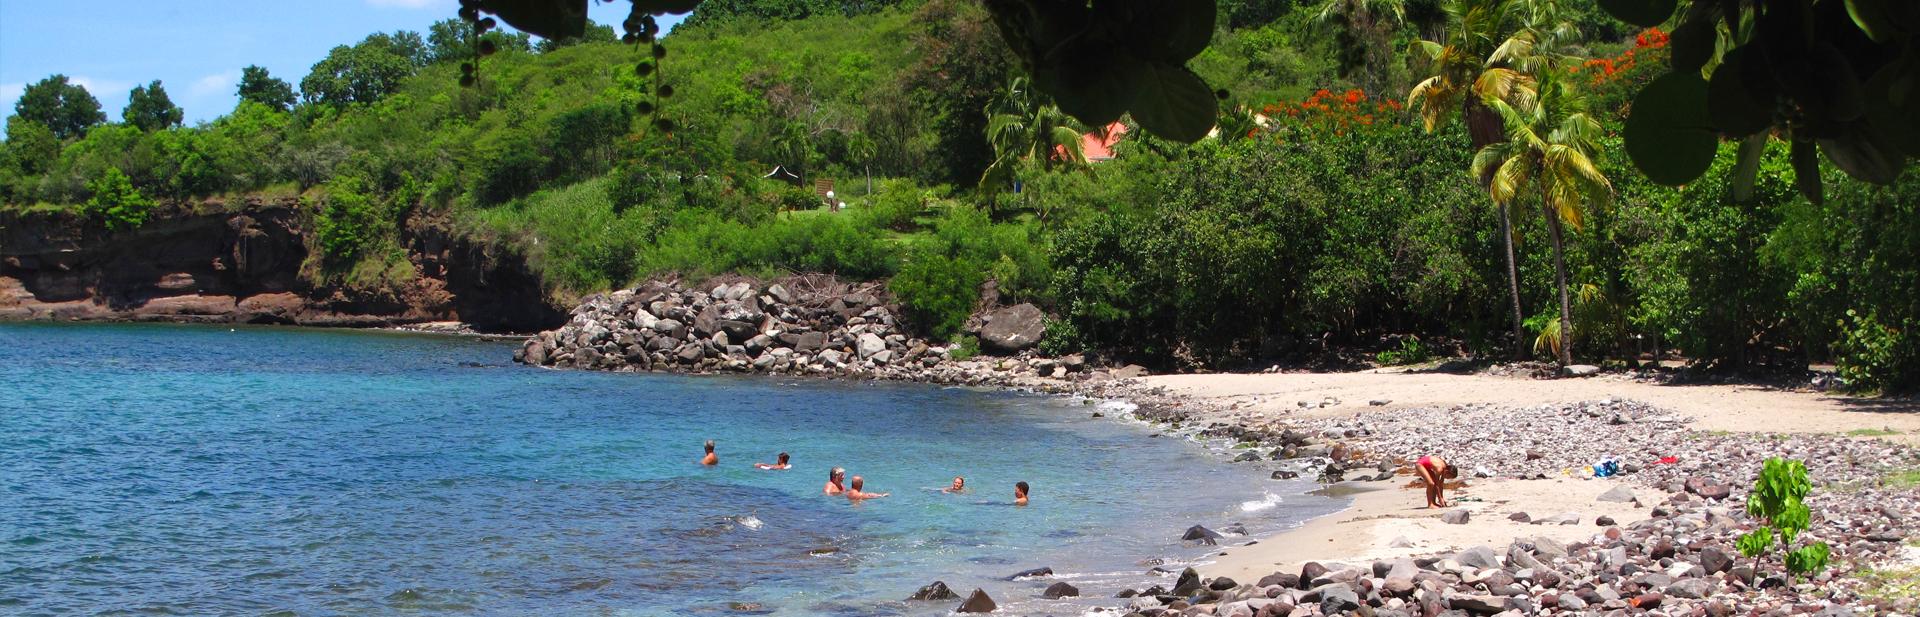 plage-bouillante-basse-terre-guadeloupe-gite-bungalow-cabazat-creole